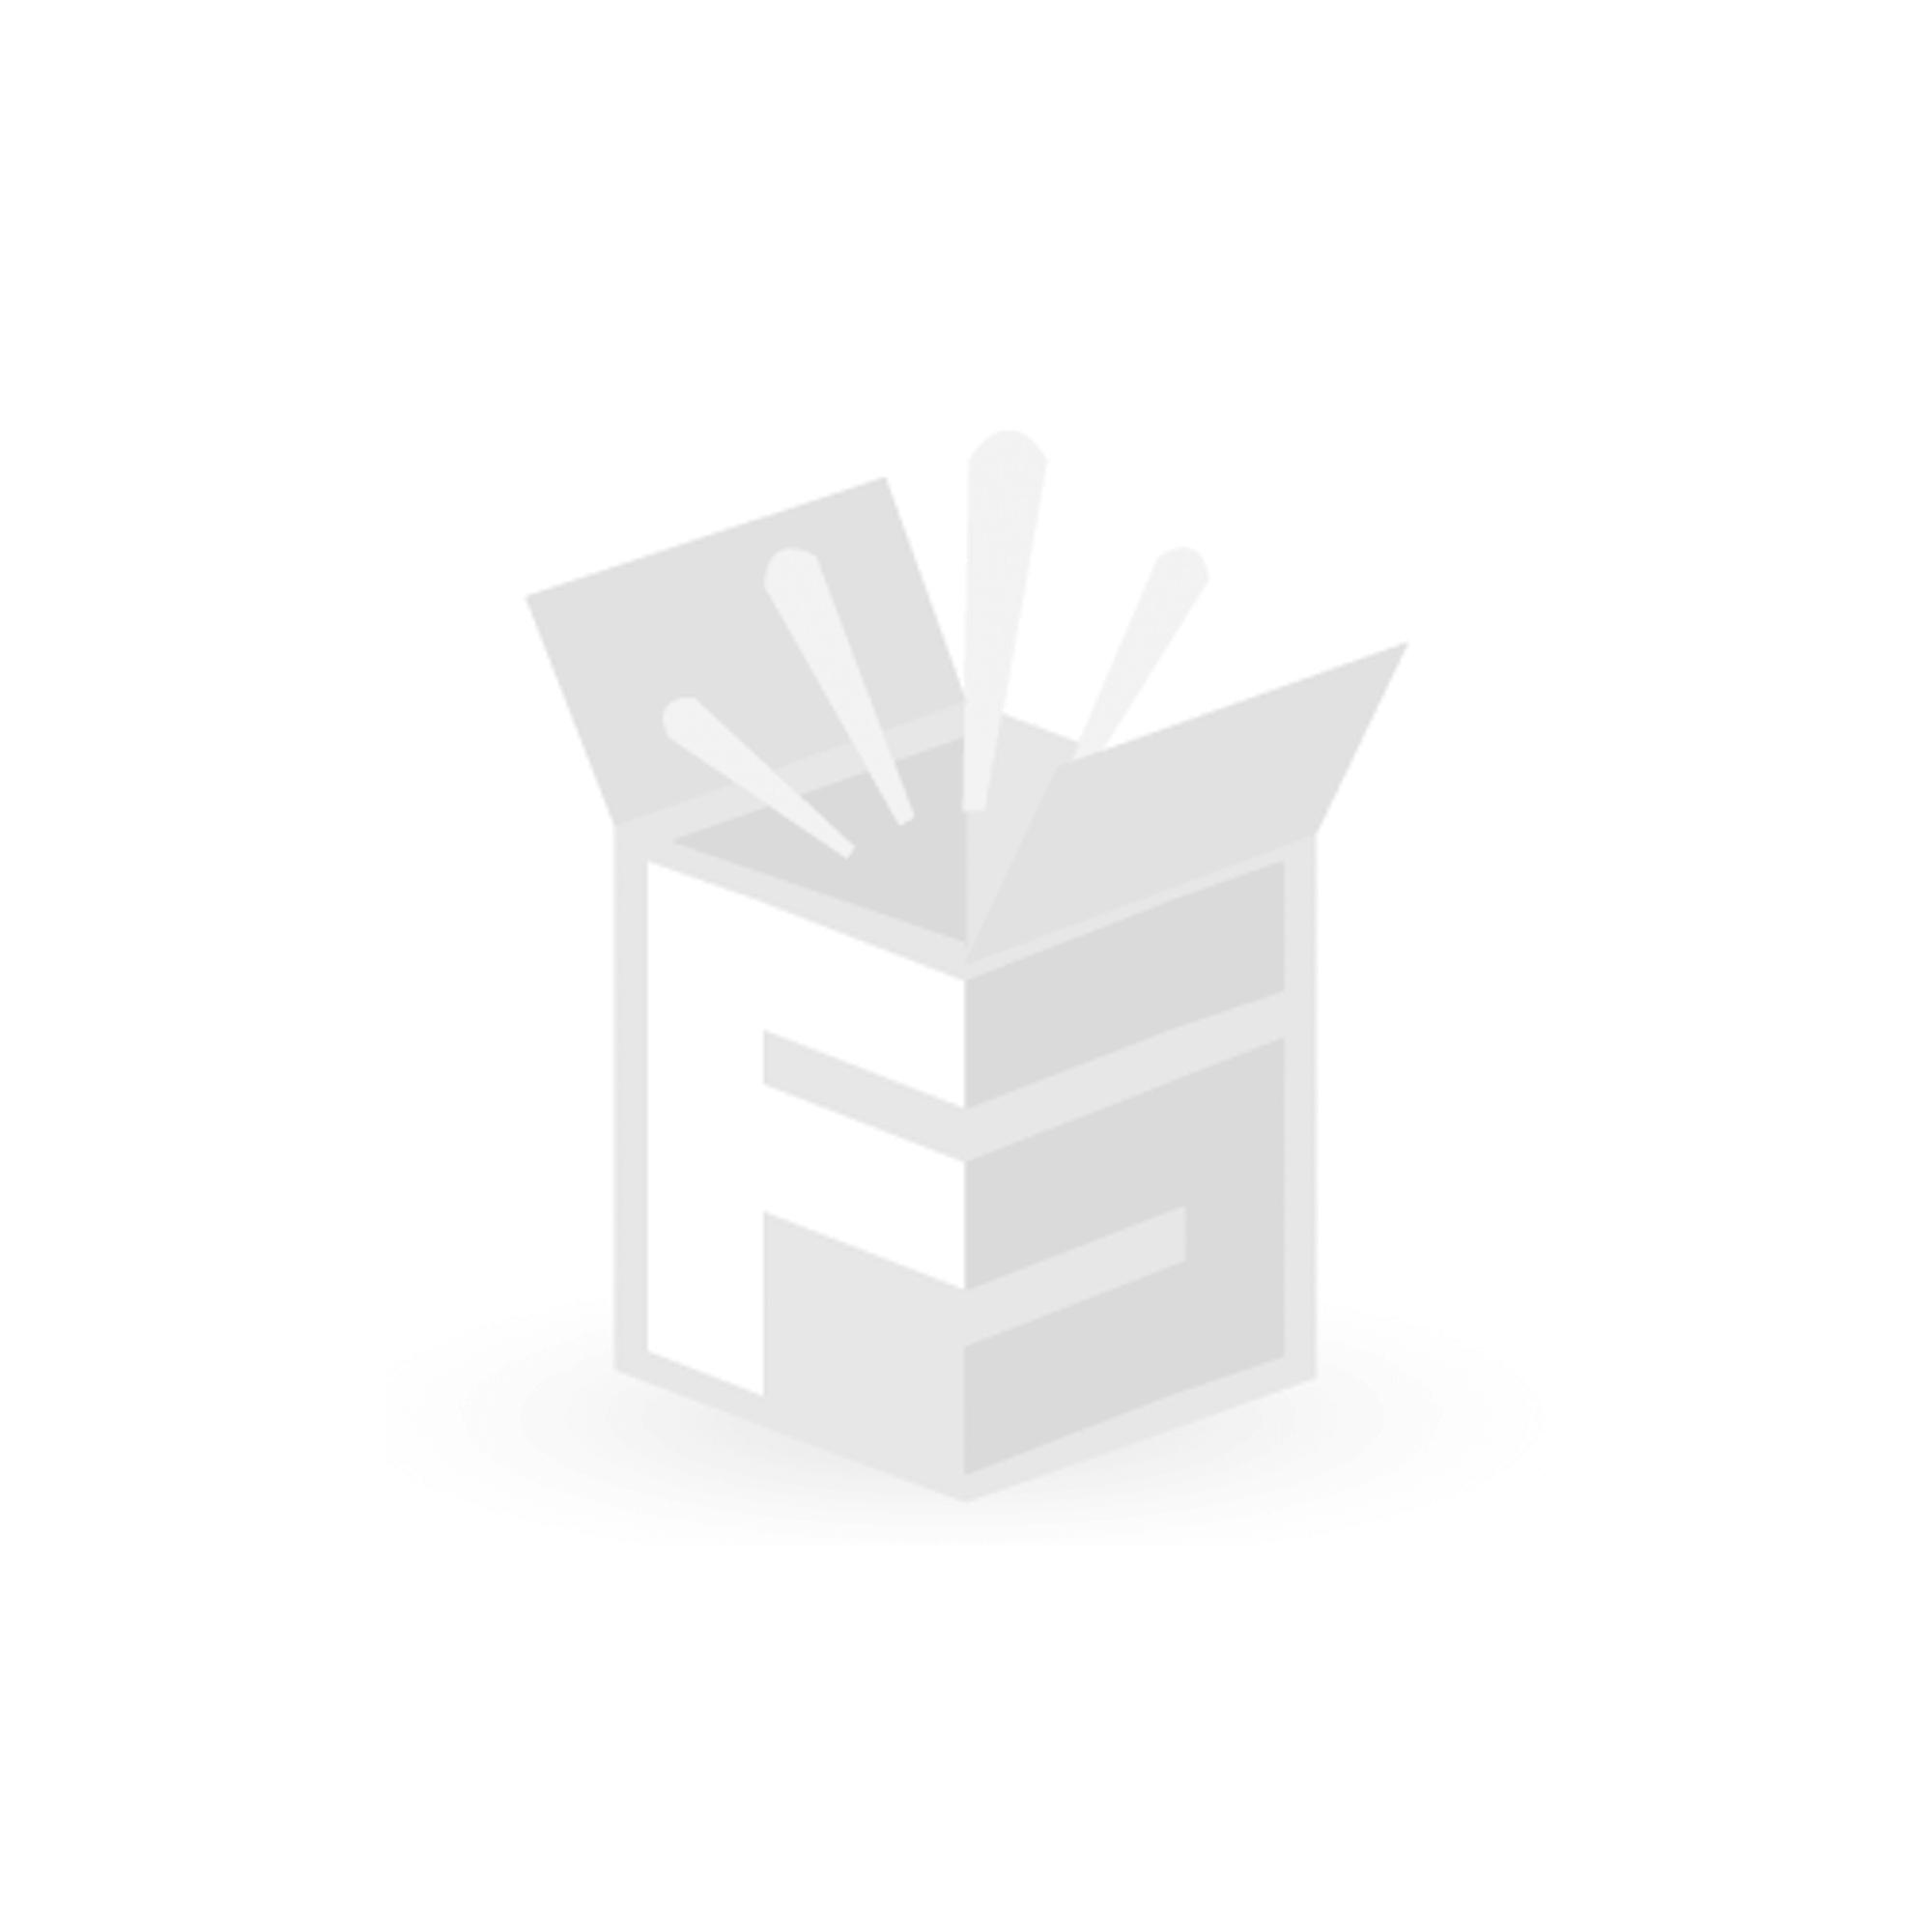 Bosch Metallbohrer-Set ProBox HSS-G 135°, 19-teilig